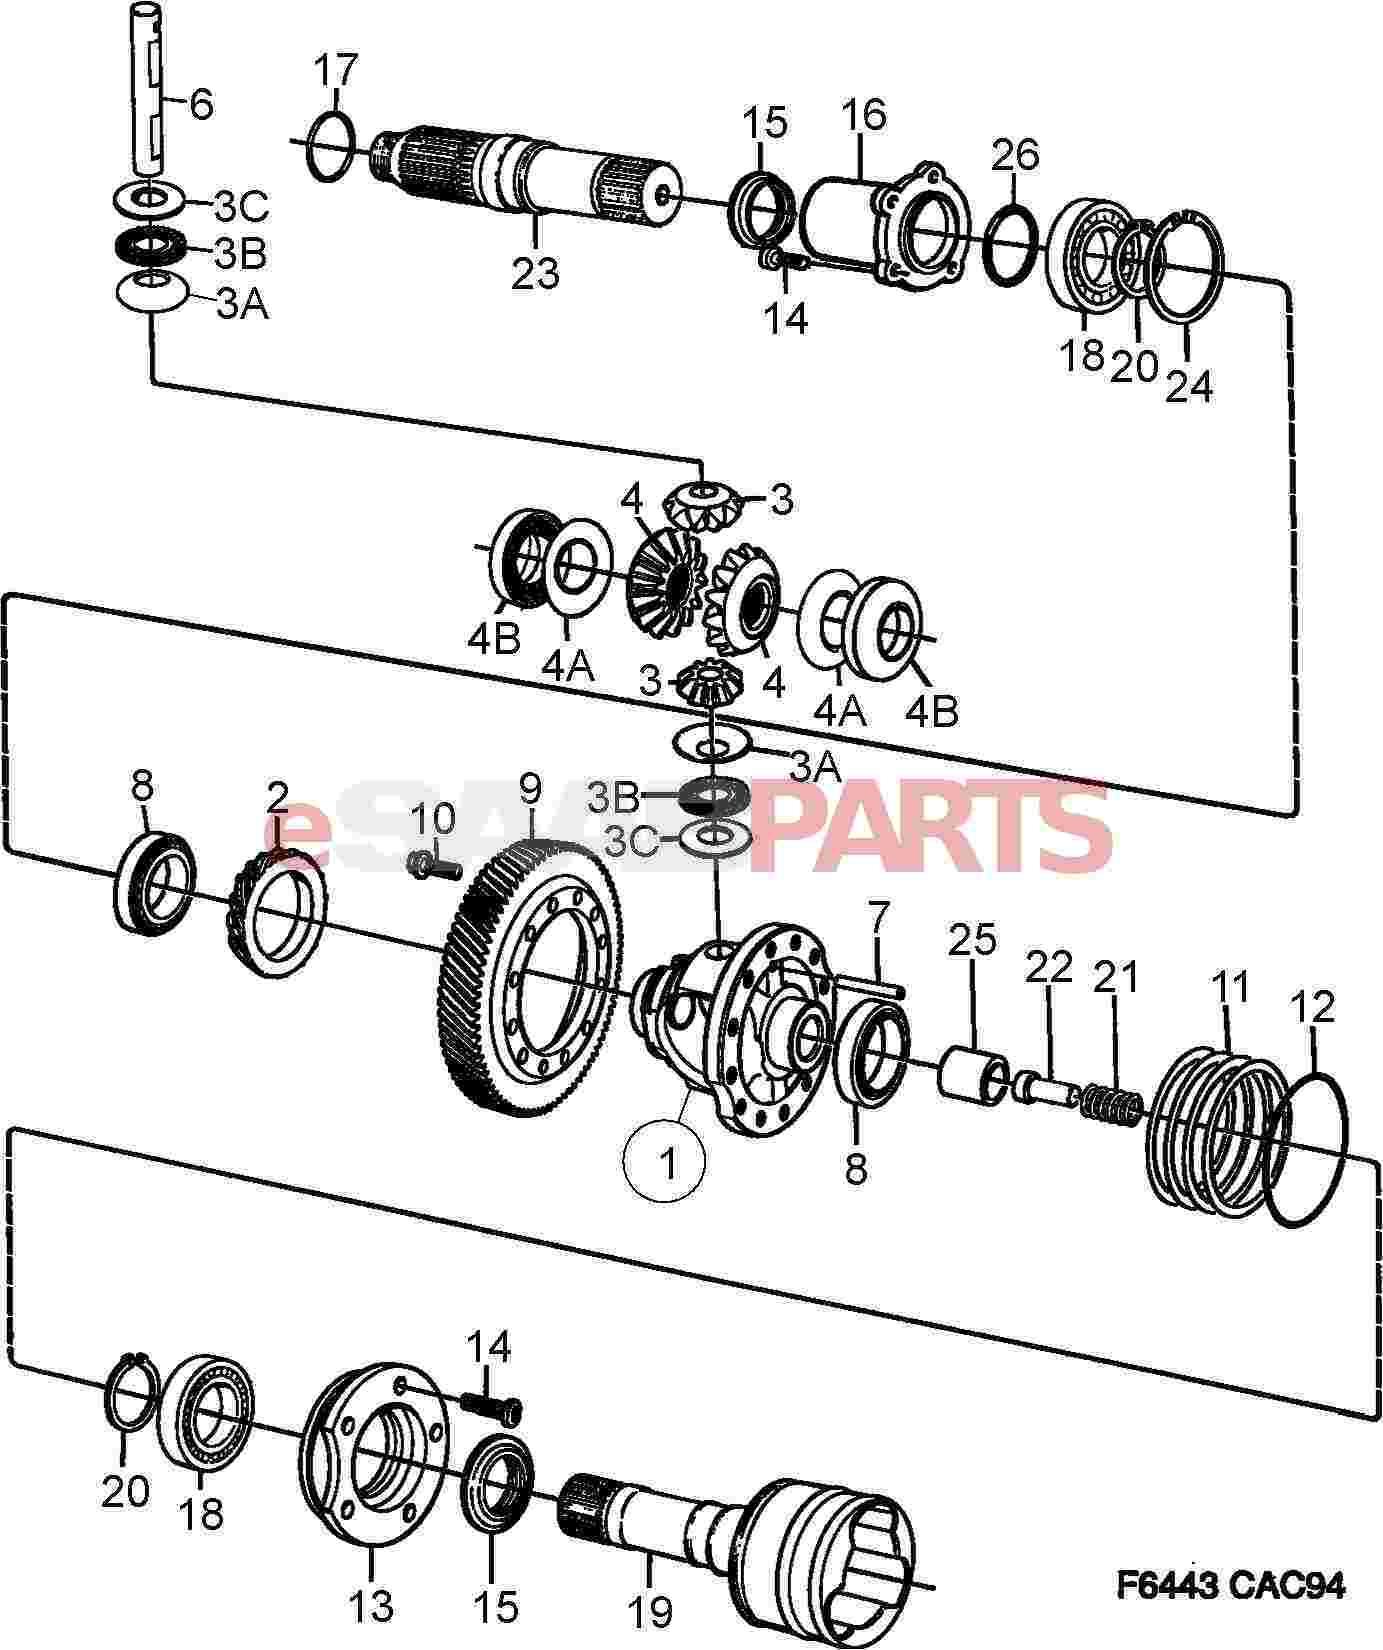 [NV_7602] Saab 9 3 Manual Transmission Diagram Wiring Diagram